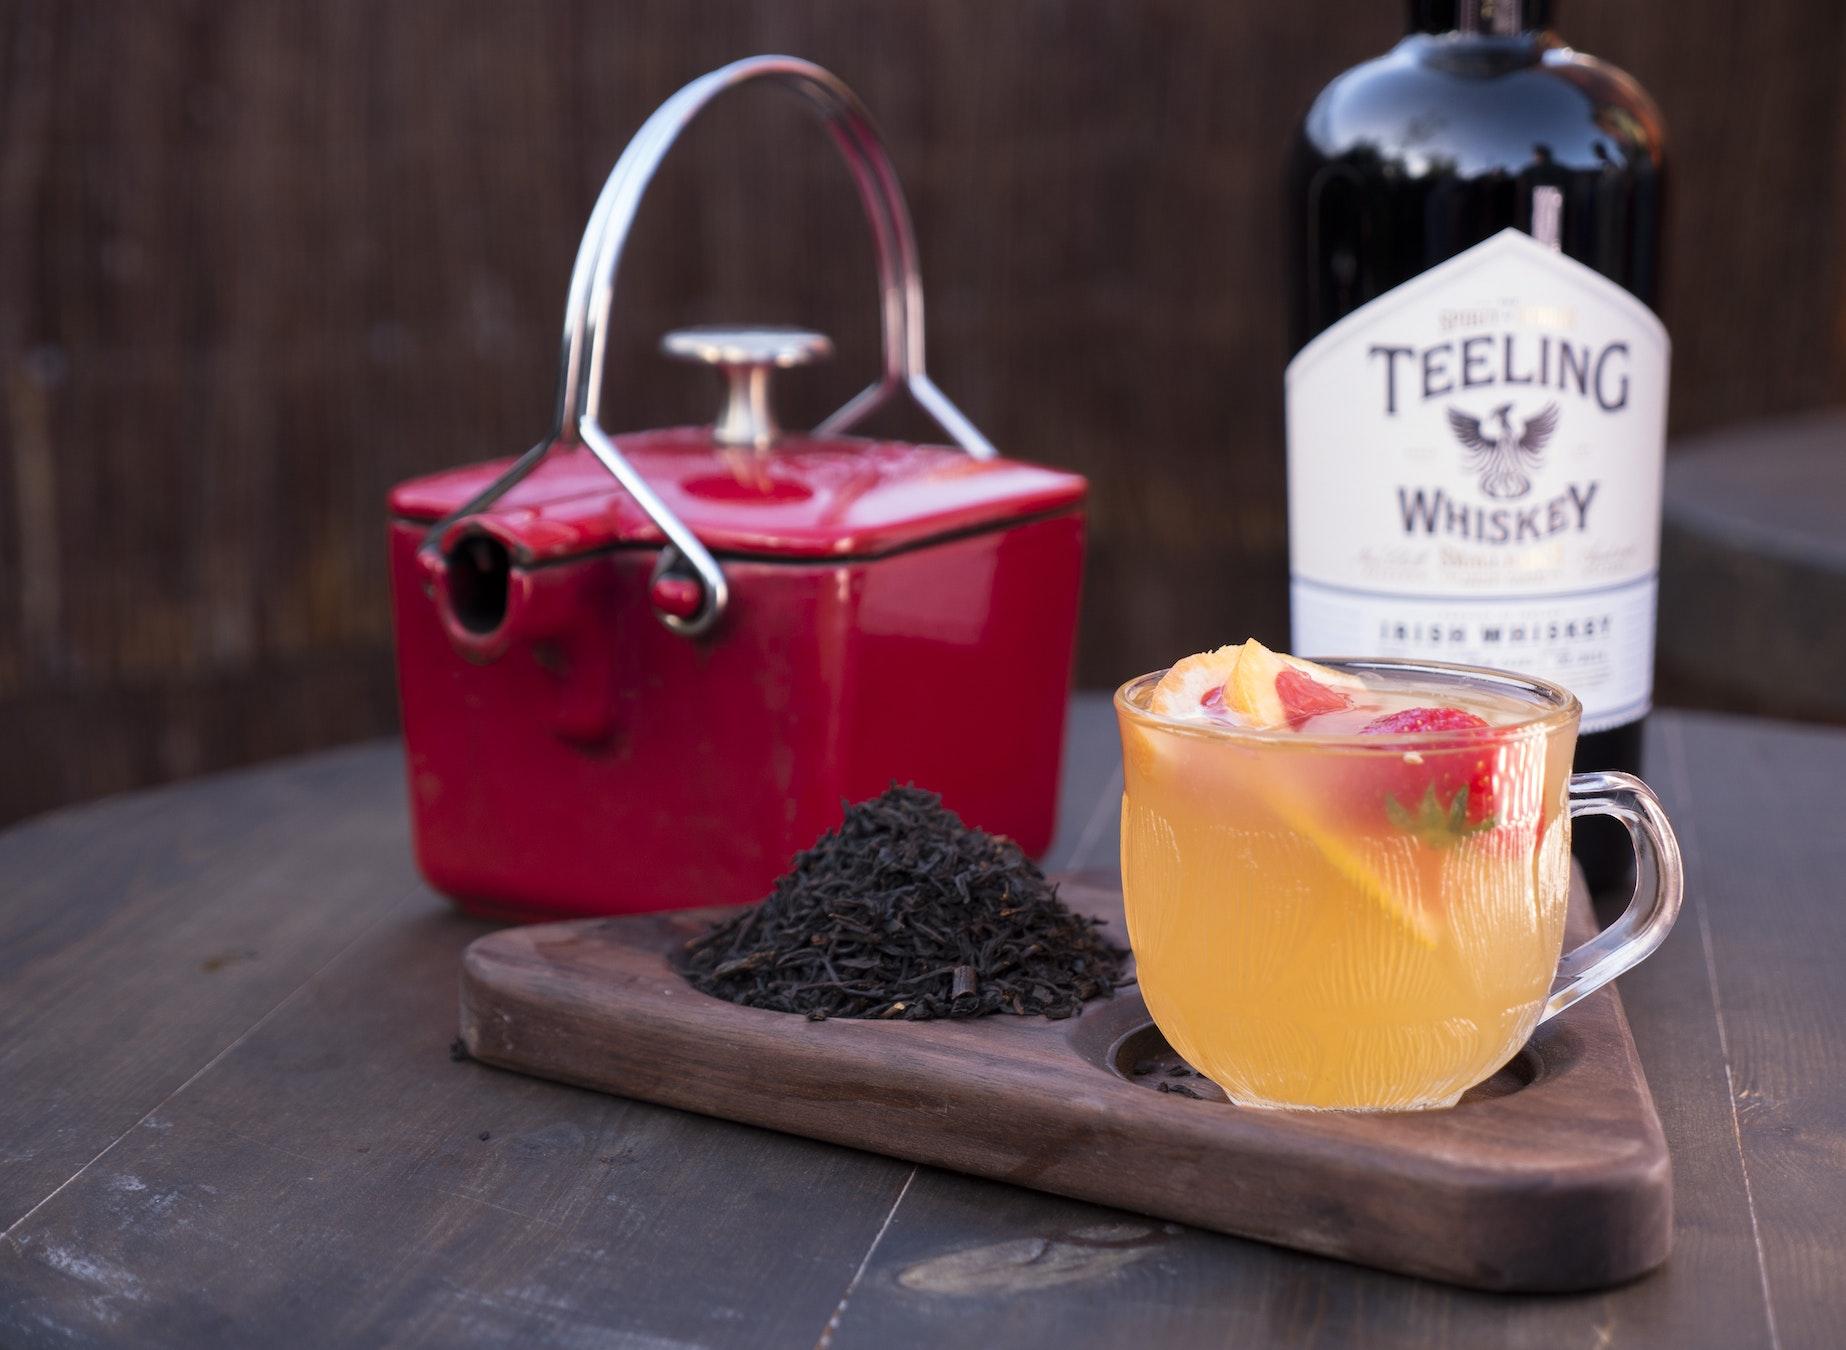 Teeling-Whisky